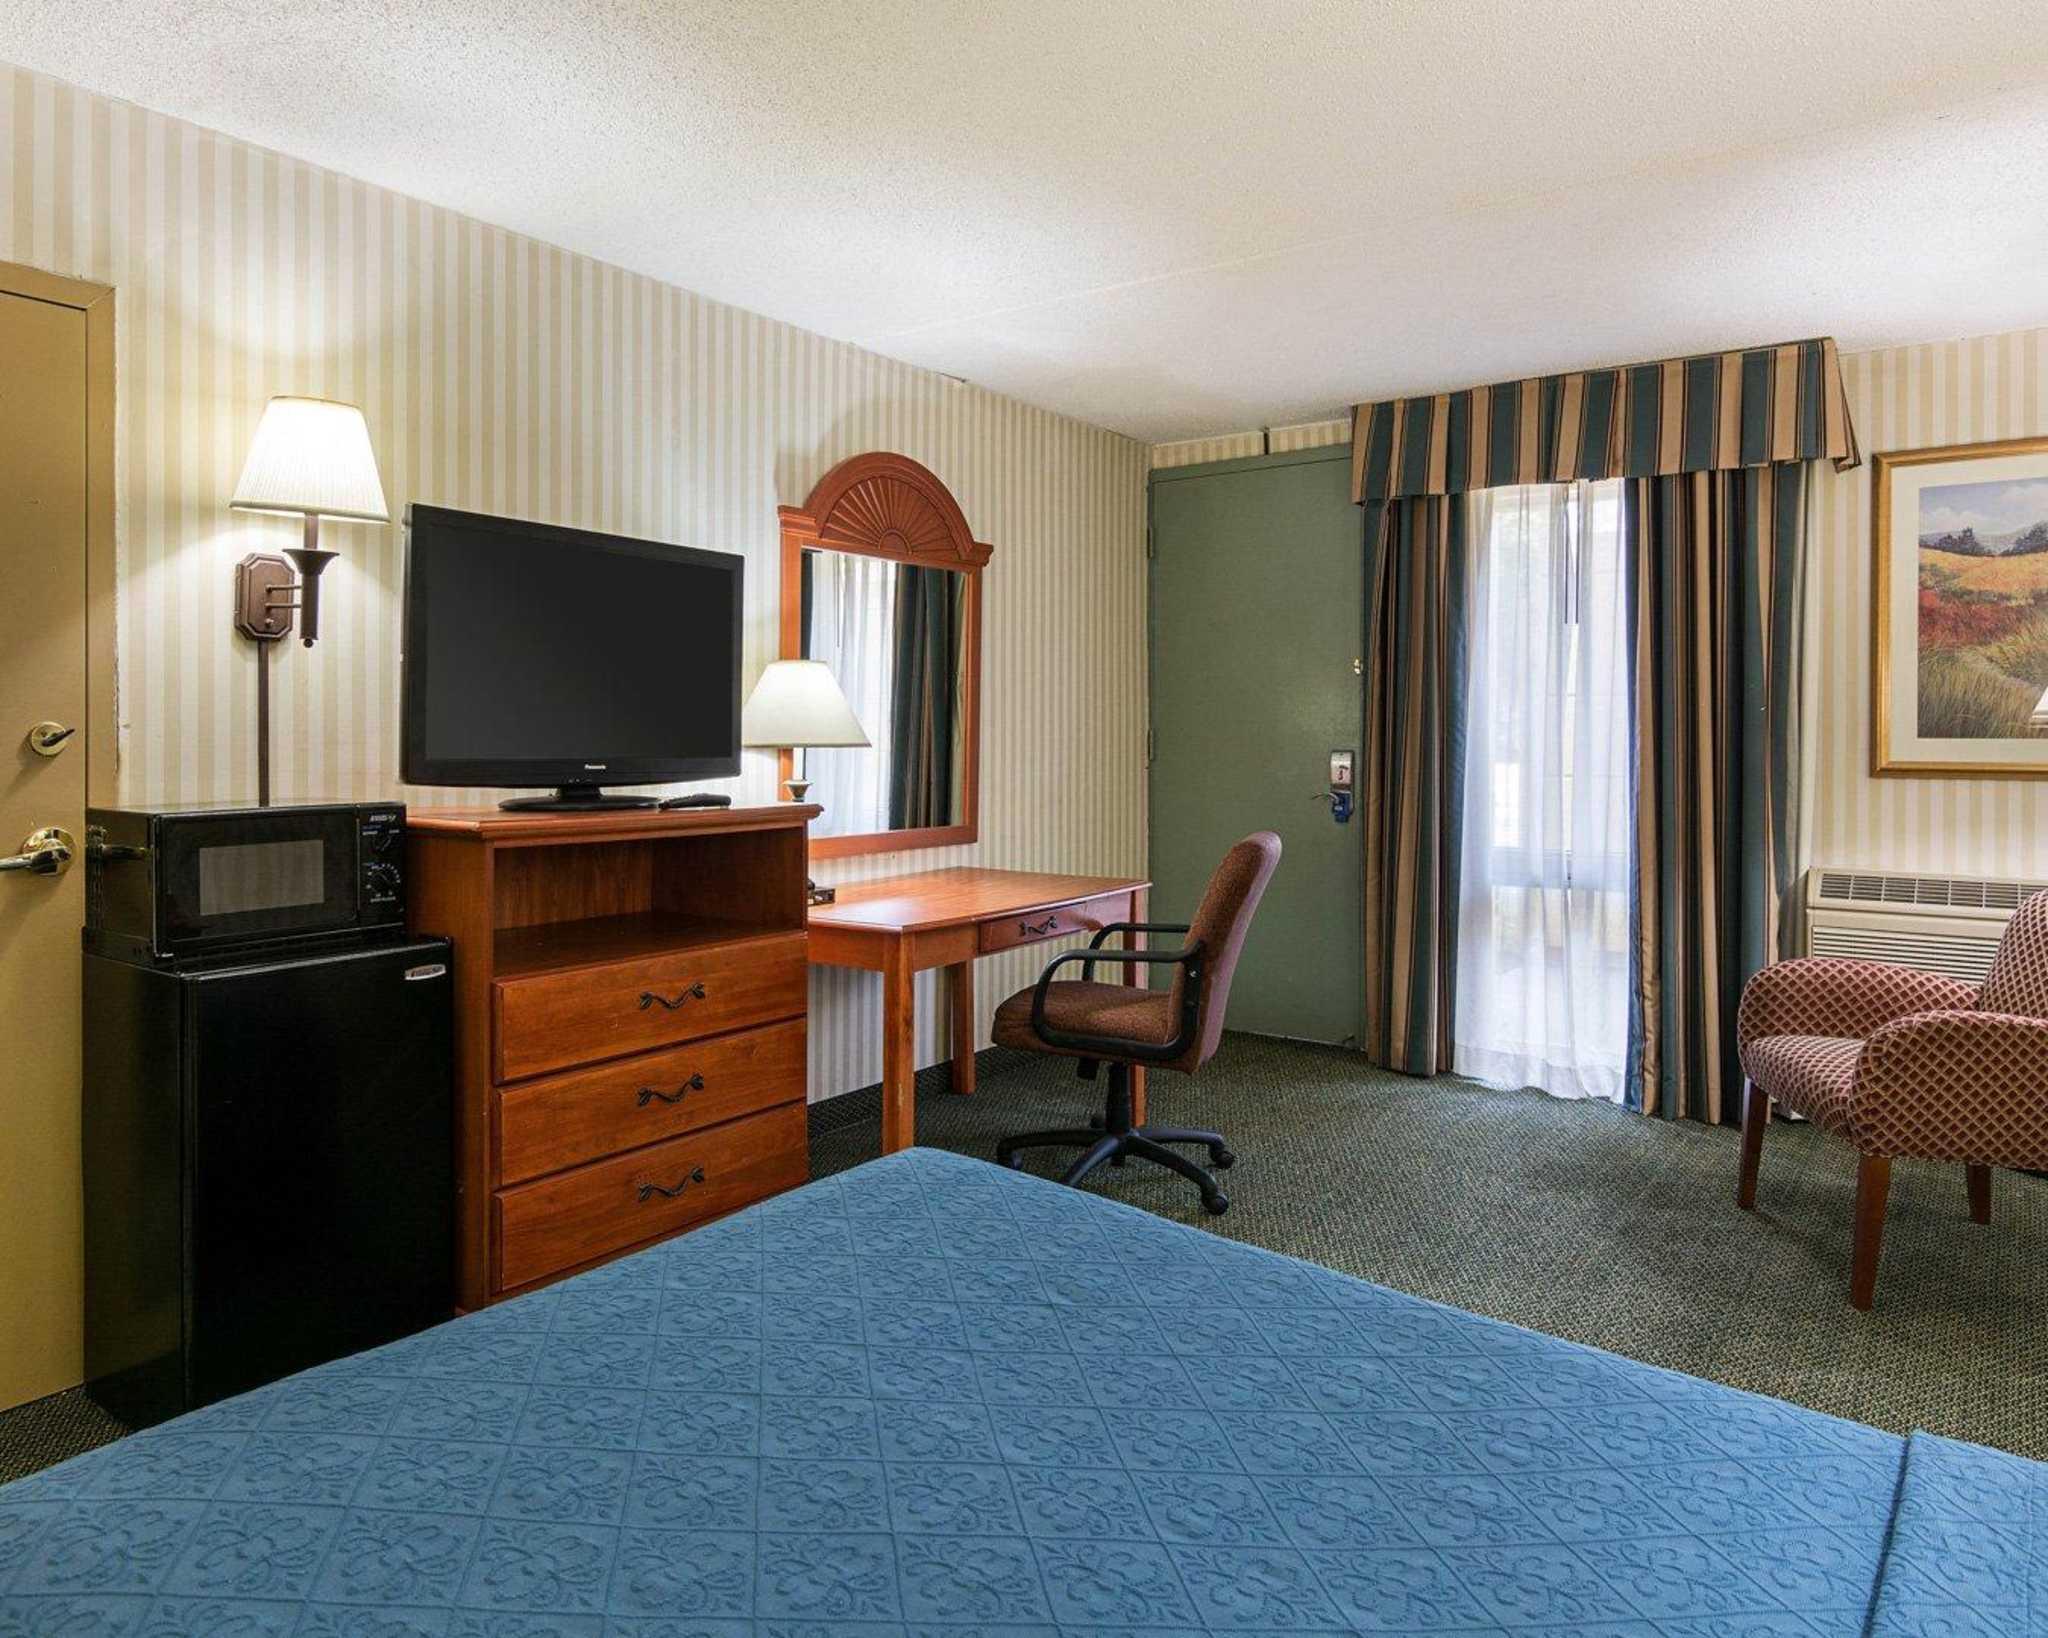 Rodeway Inn image 13